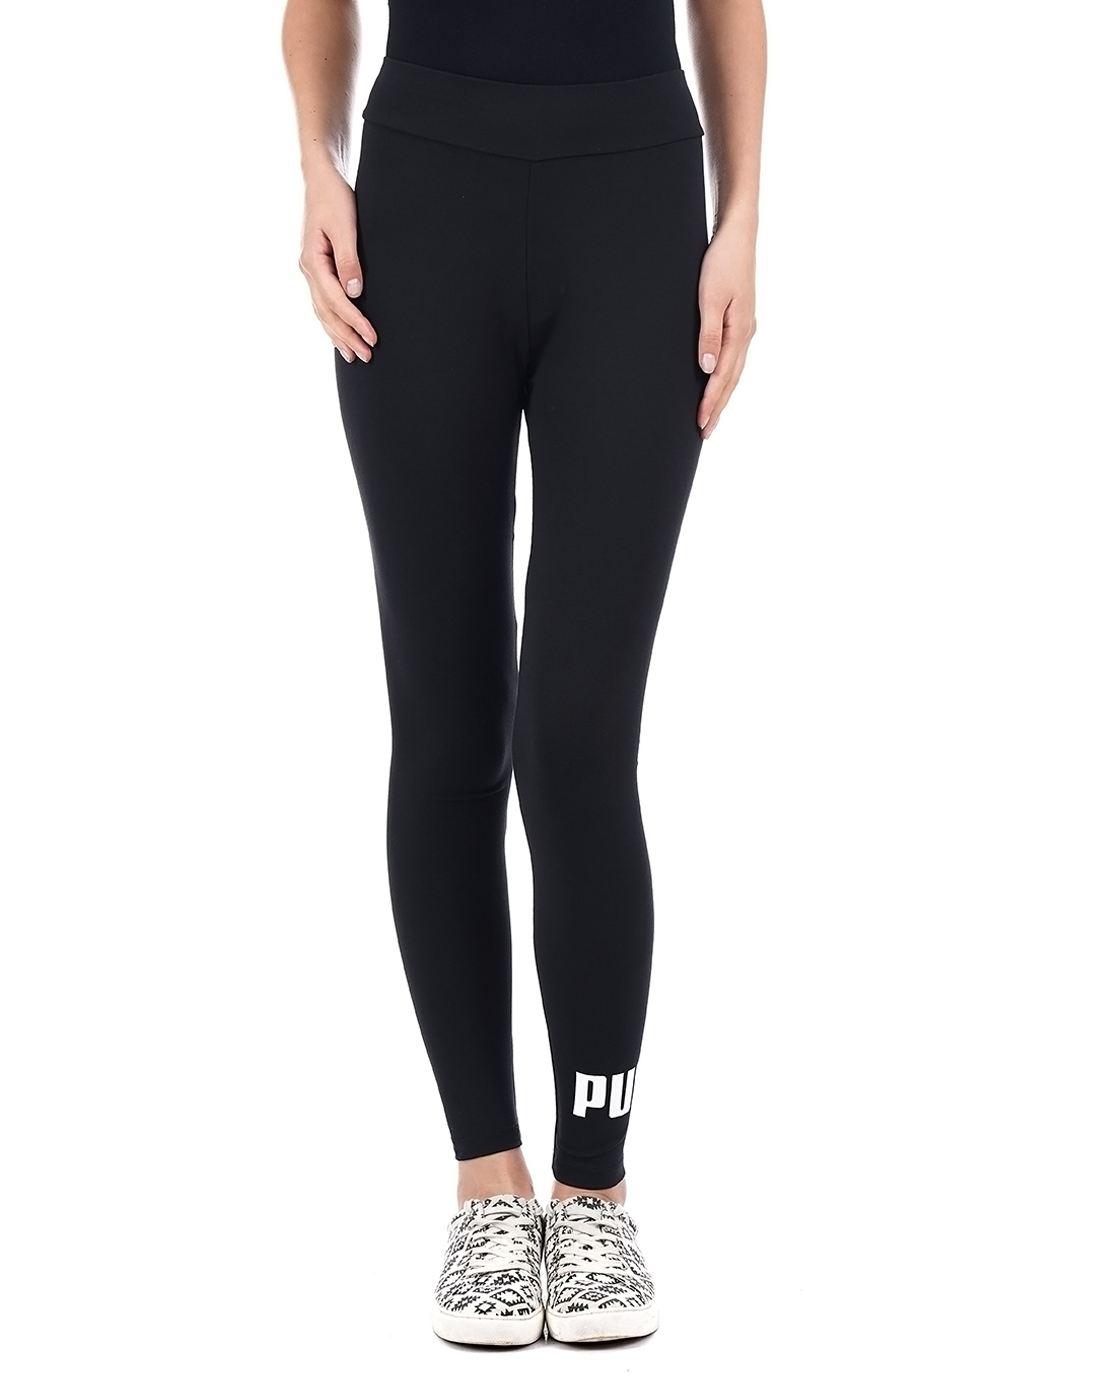 Puma Women Black Track Pant